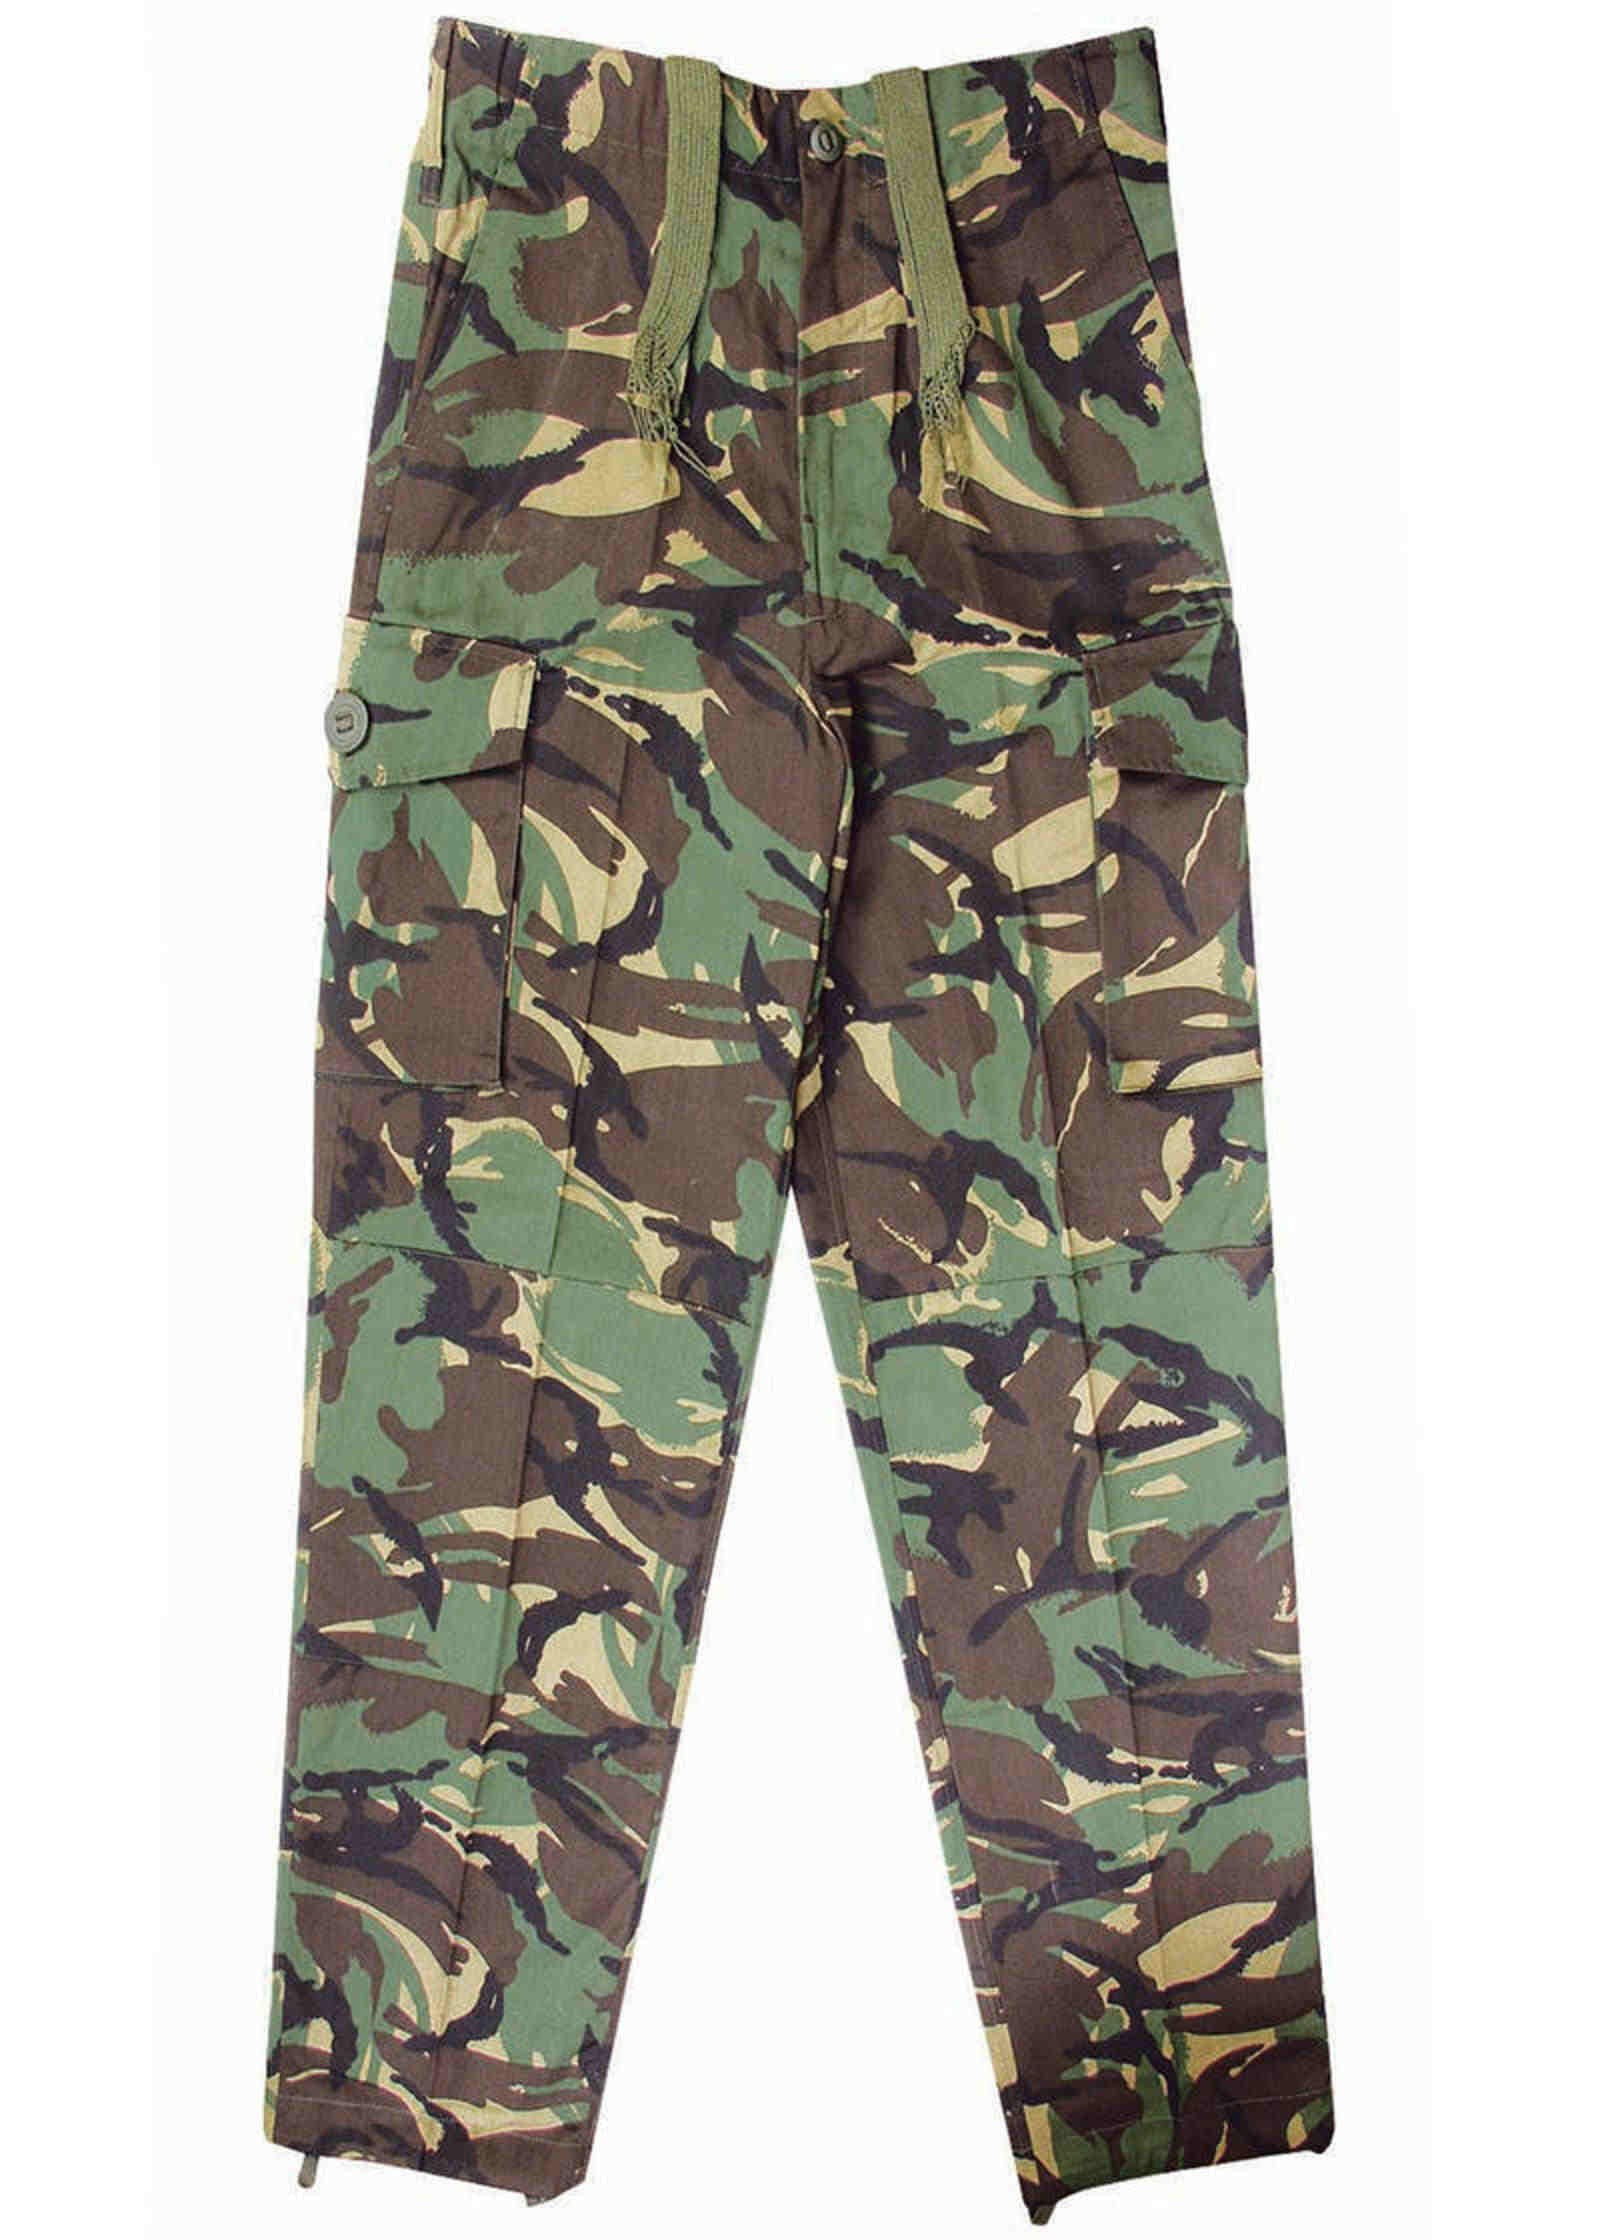 MIL-COM KIDS DPM CAMO T-SHIRT  hard wearing childrens uk british army camouflage